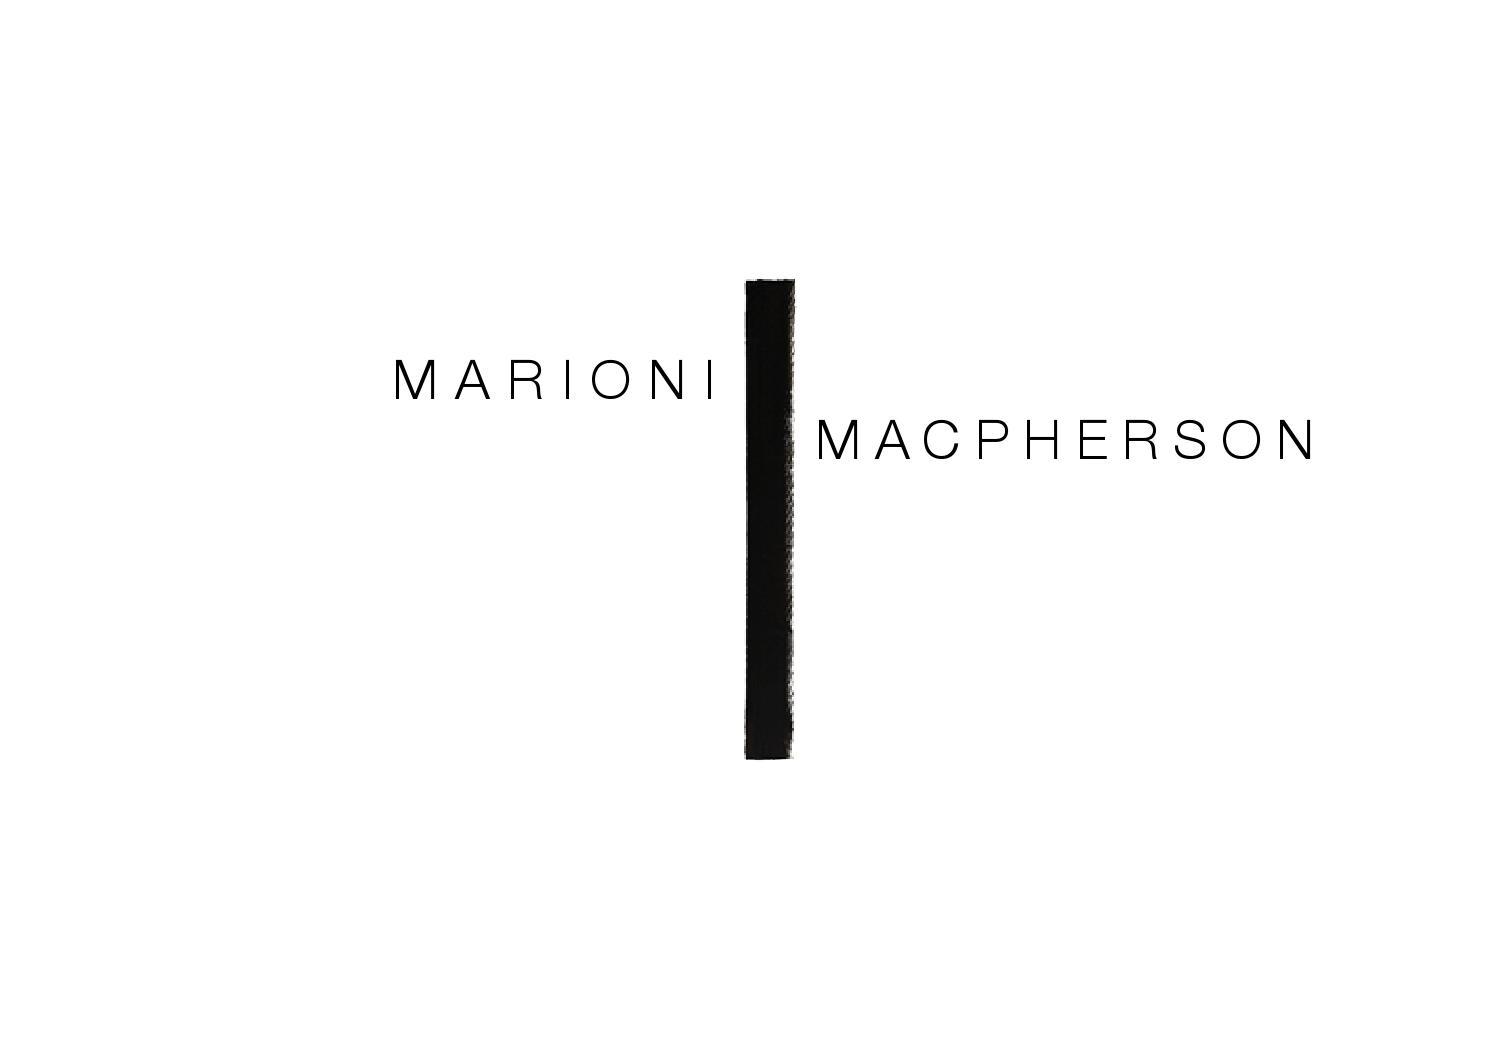 Marioni Macpherson By Uq Art Museum Issuu 19871989 Gauge Cluster Circuit Board